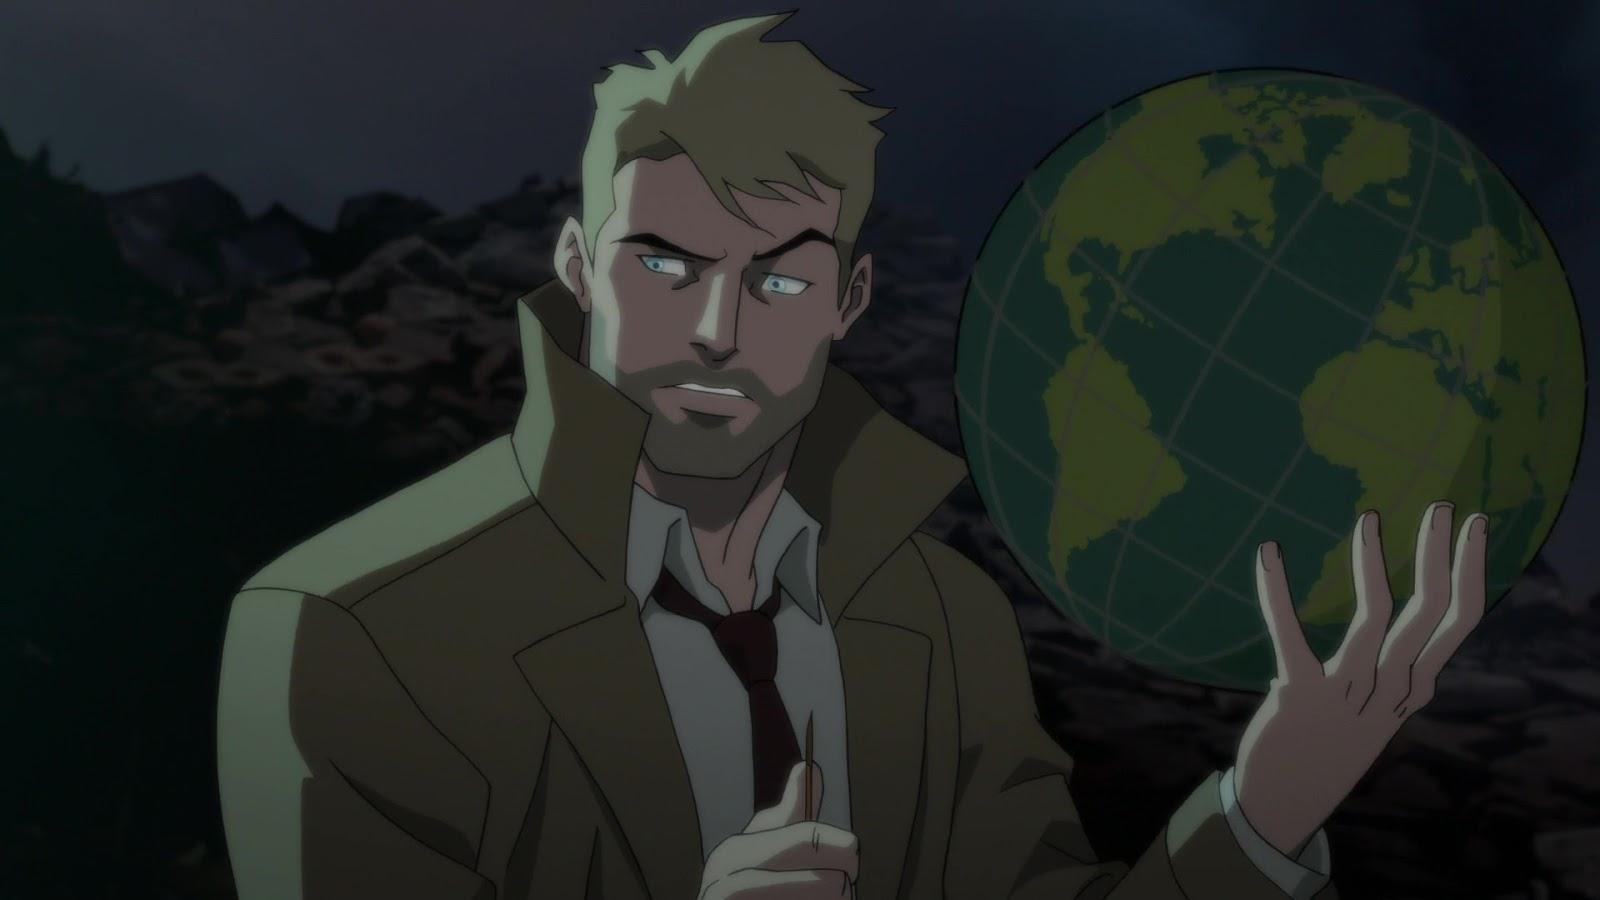 Justice League Dark: Apokolips War (2020) 1080P BRRIP Latino - Ingles